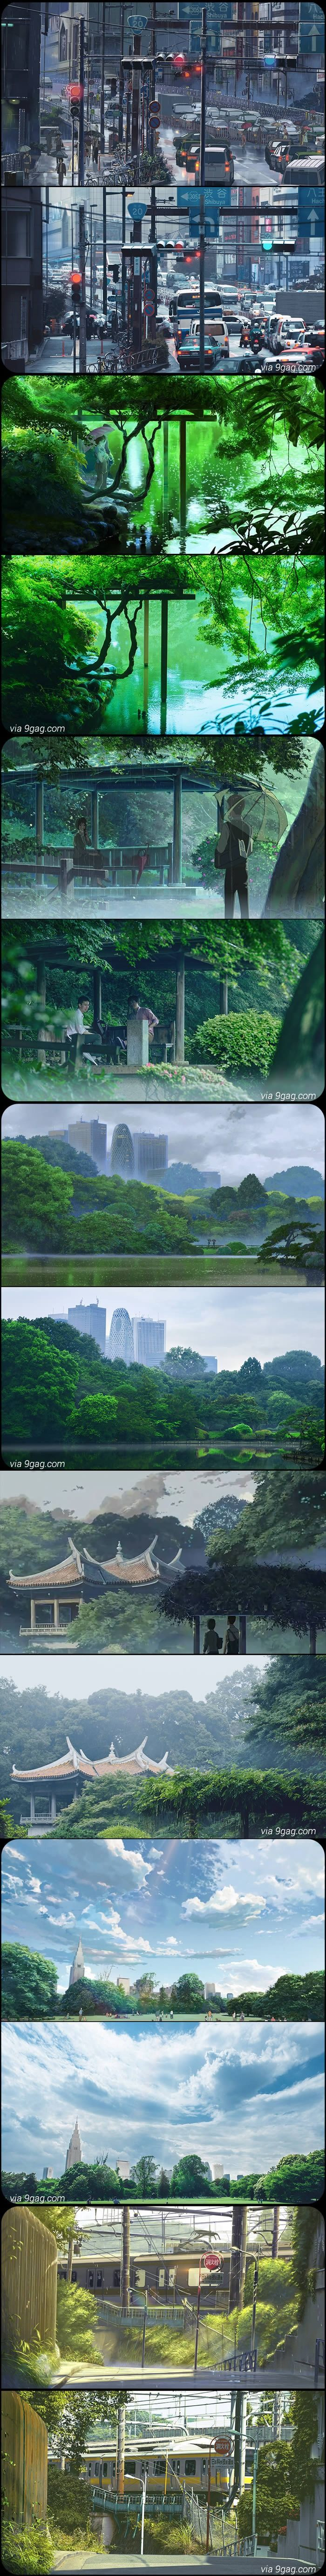 Animation Background vs Real Life- Garden Of Words - Makoto Shinkai